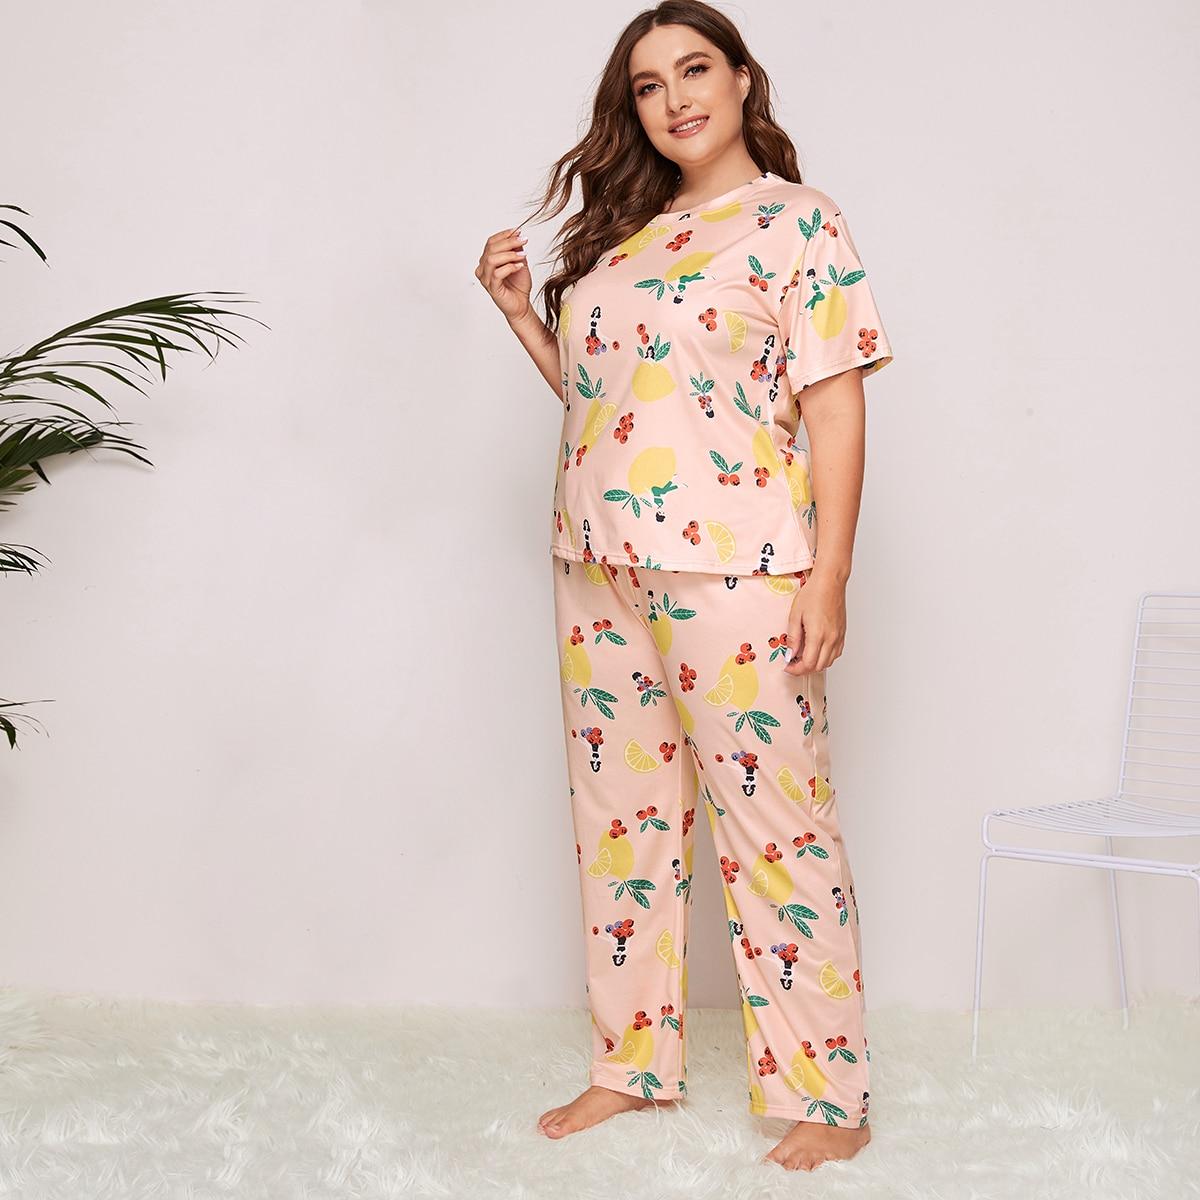 shein Roze  Schattig Fruit & groenten Grote maten pyjama sets